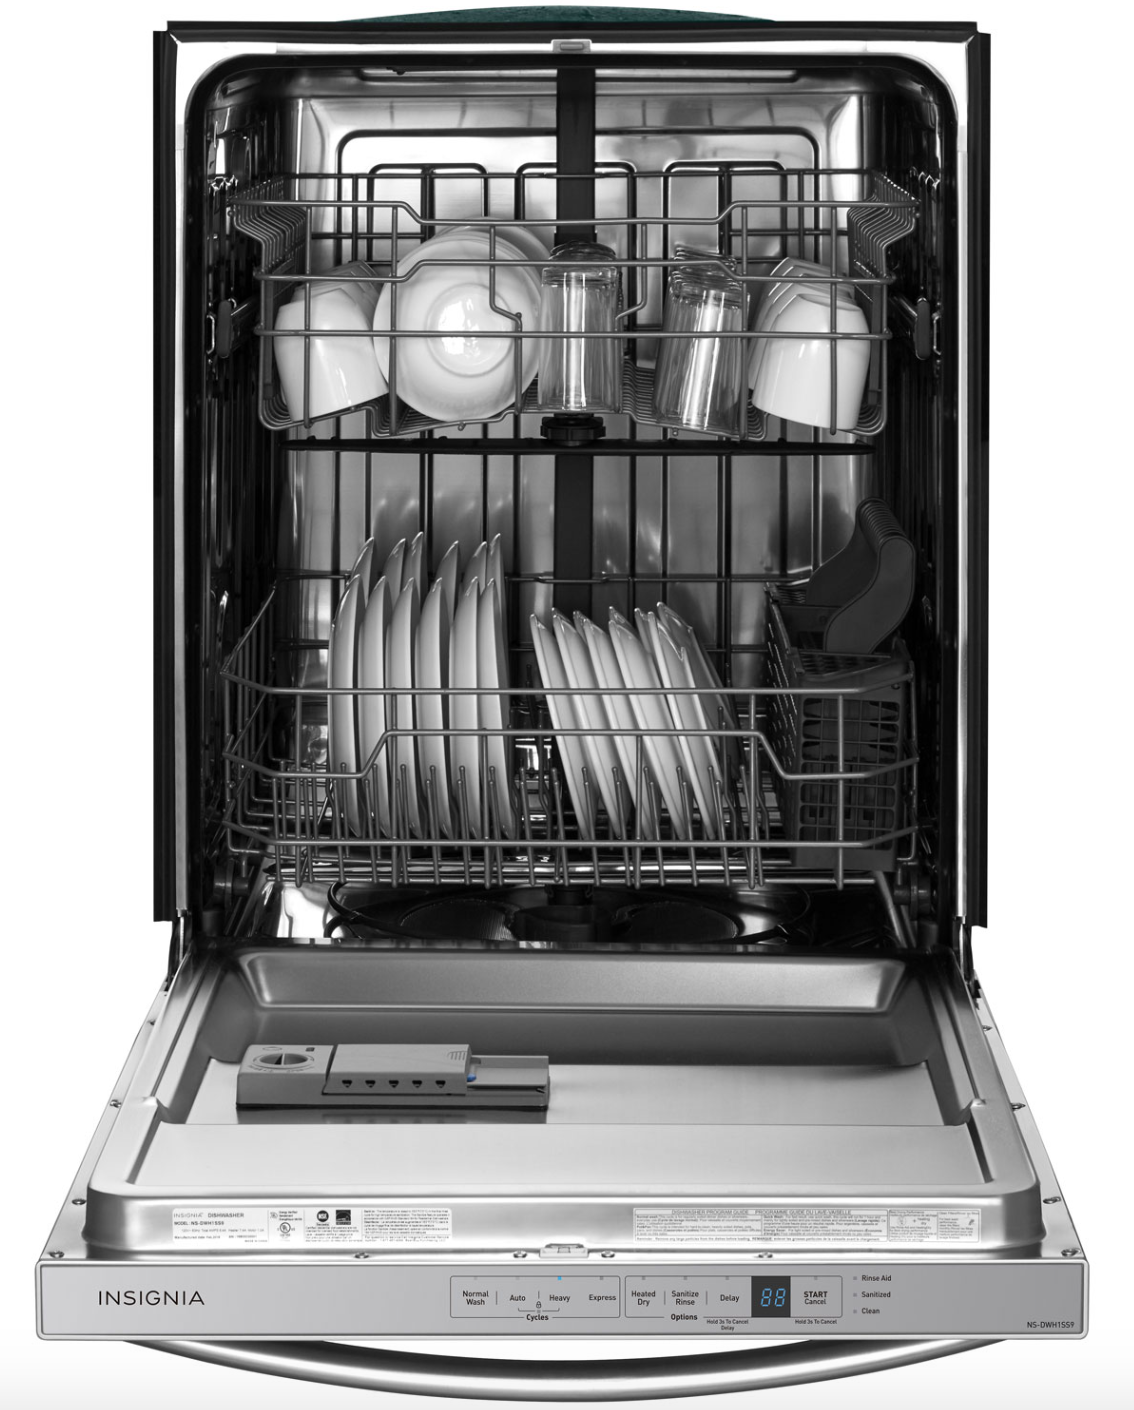 Insignia dishwasher